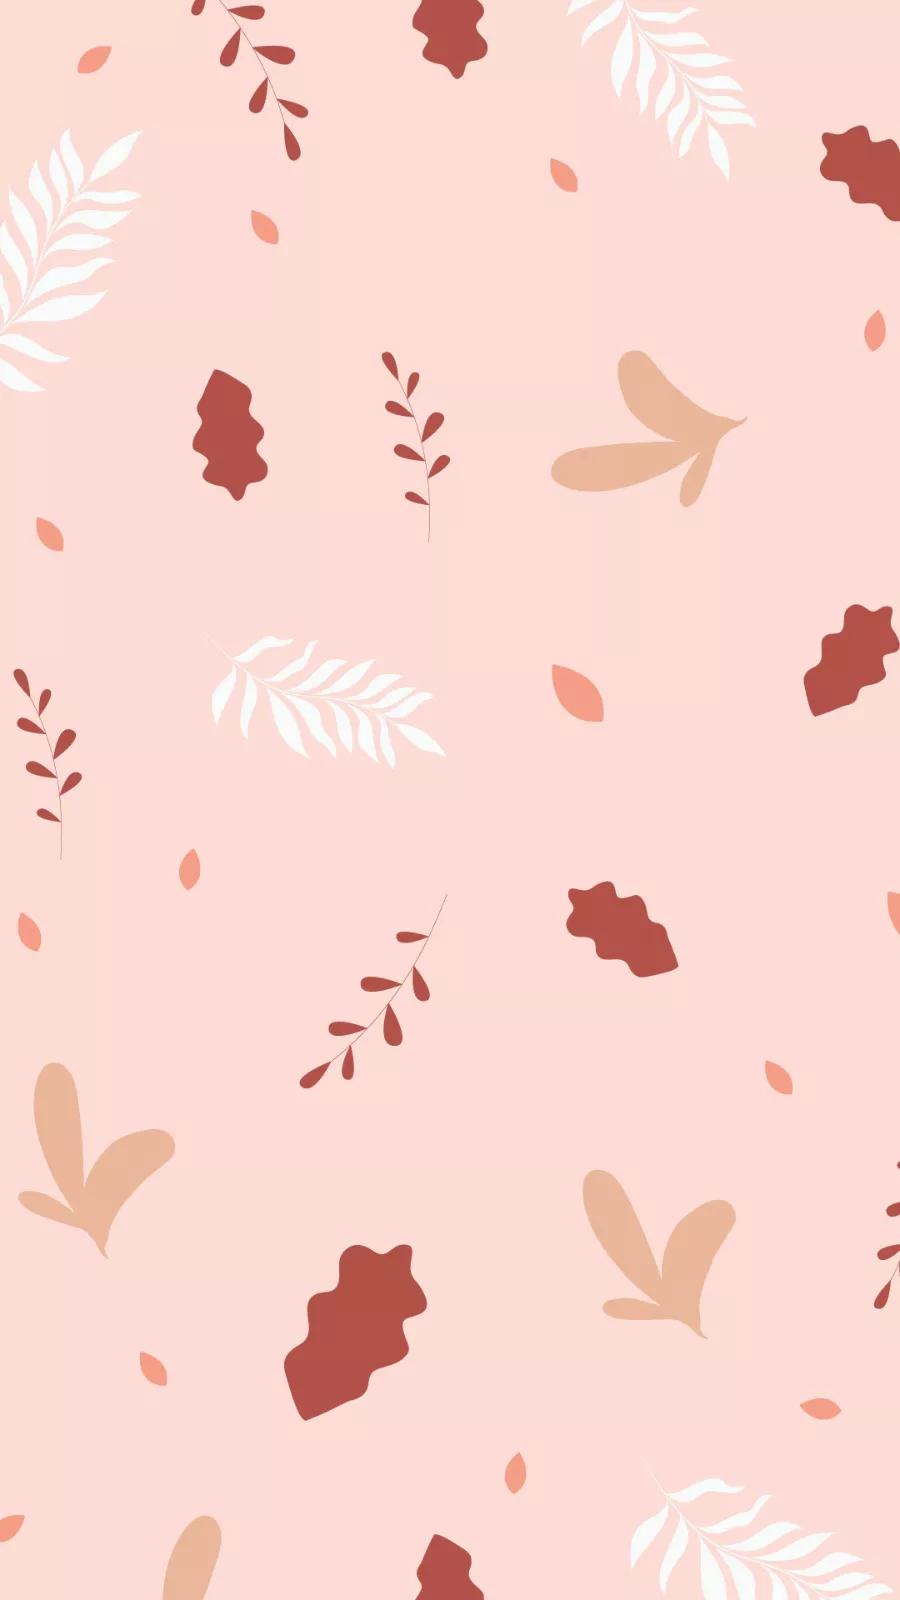 The Cutest 2020 Printable Calendars Free Blogilates Cute Fall Wallpaper Fall Wallpaper Cute Patterns Wallpaper